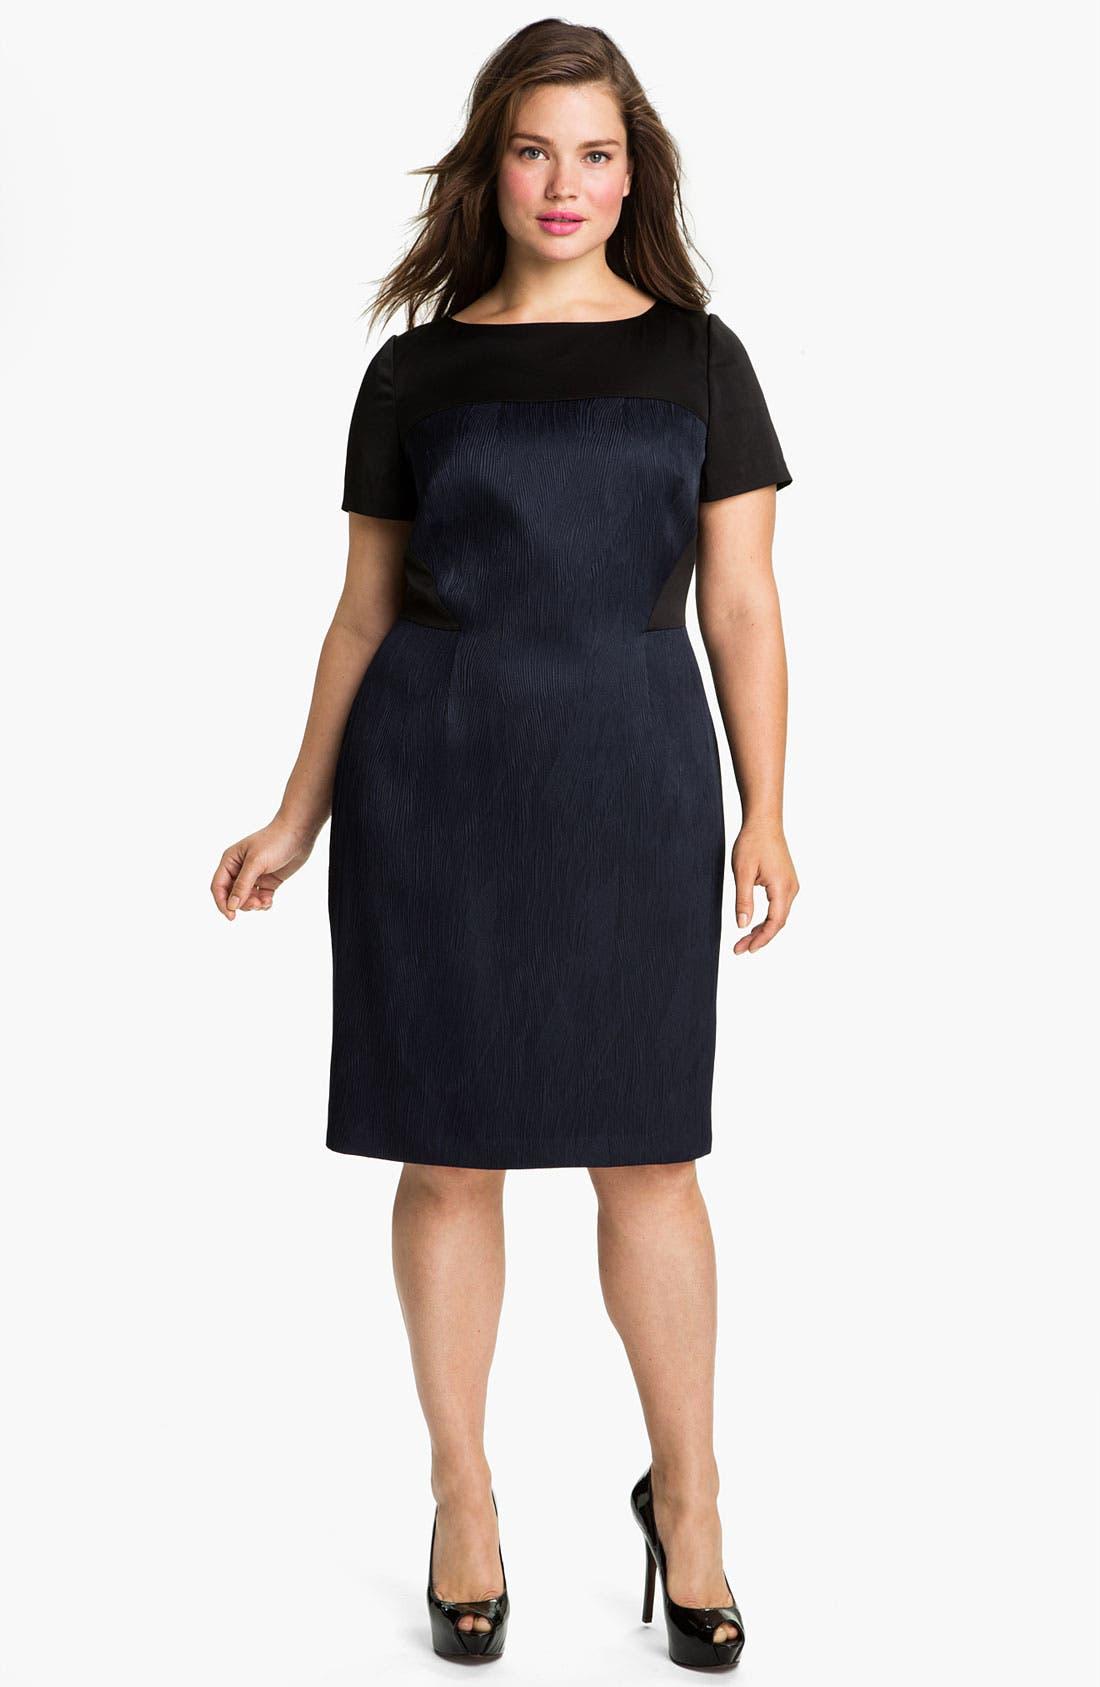 Alternate Image 1 Selected - Adrianna Papell Colorblock Bateau Neck Jacquard Sheath Dress (Plus)